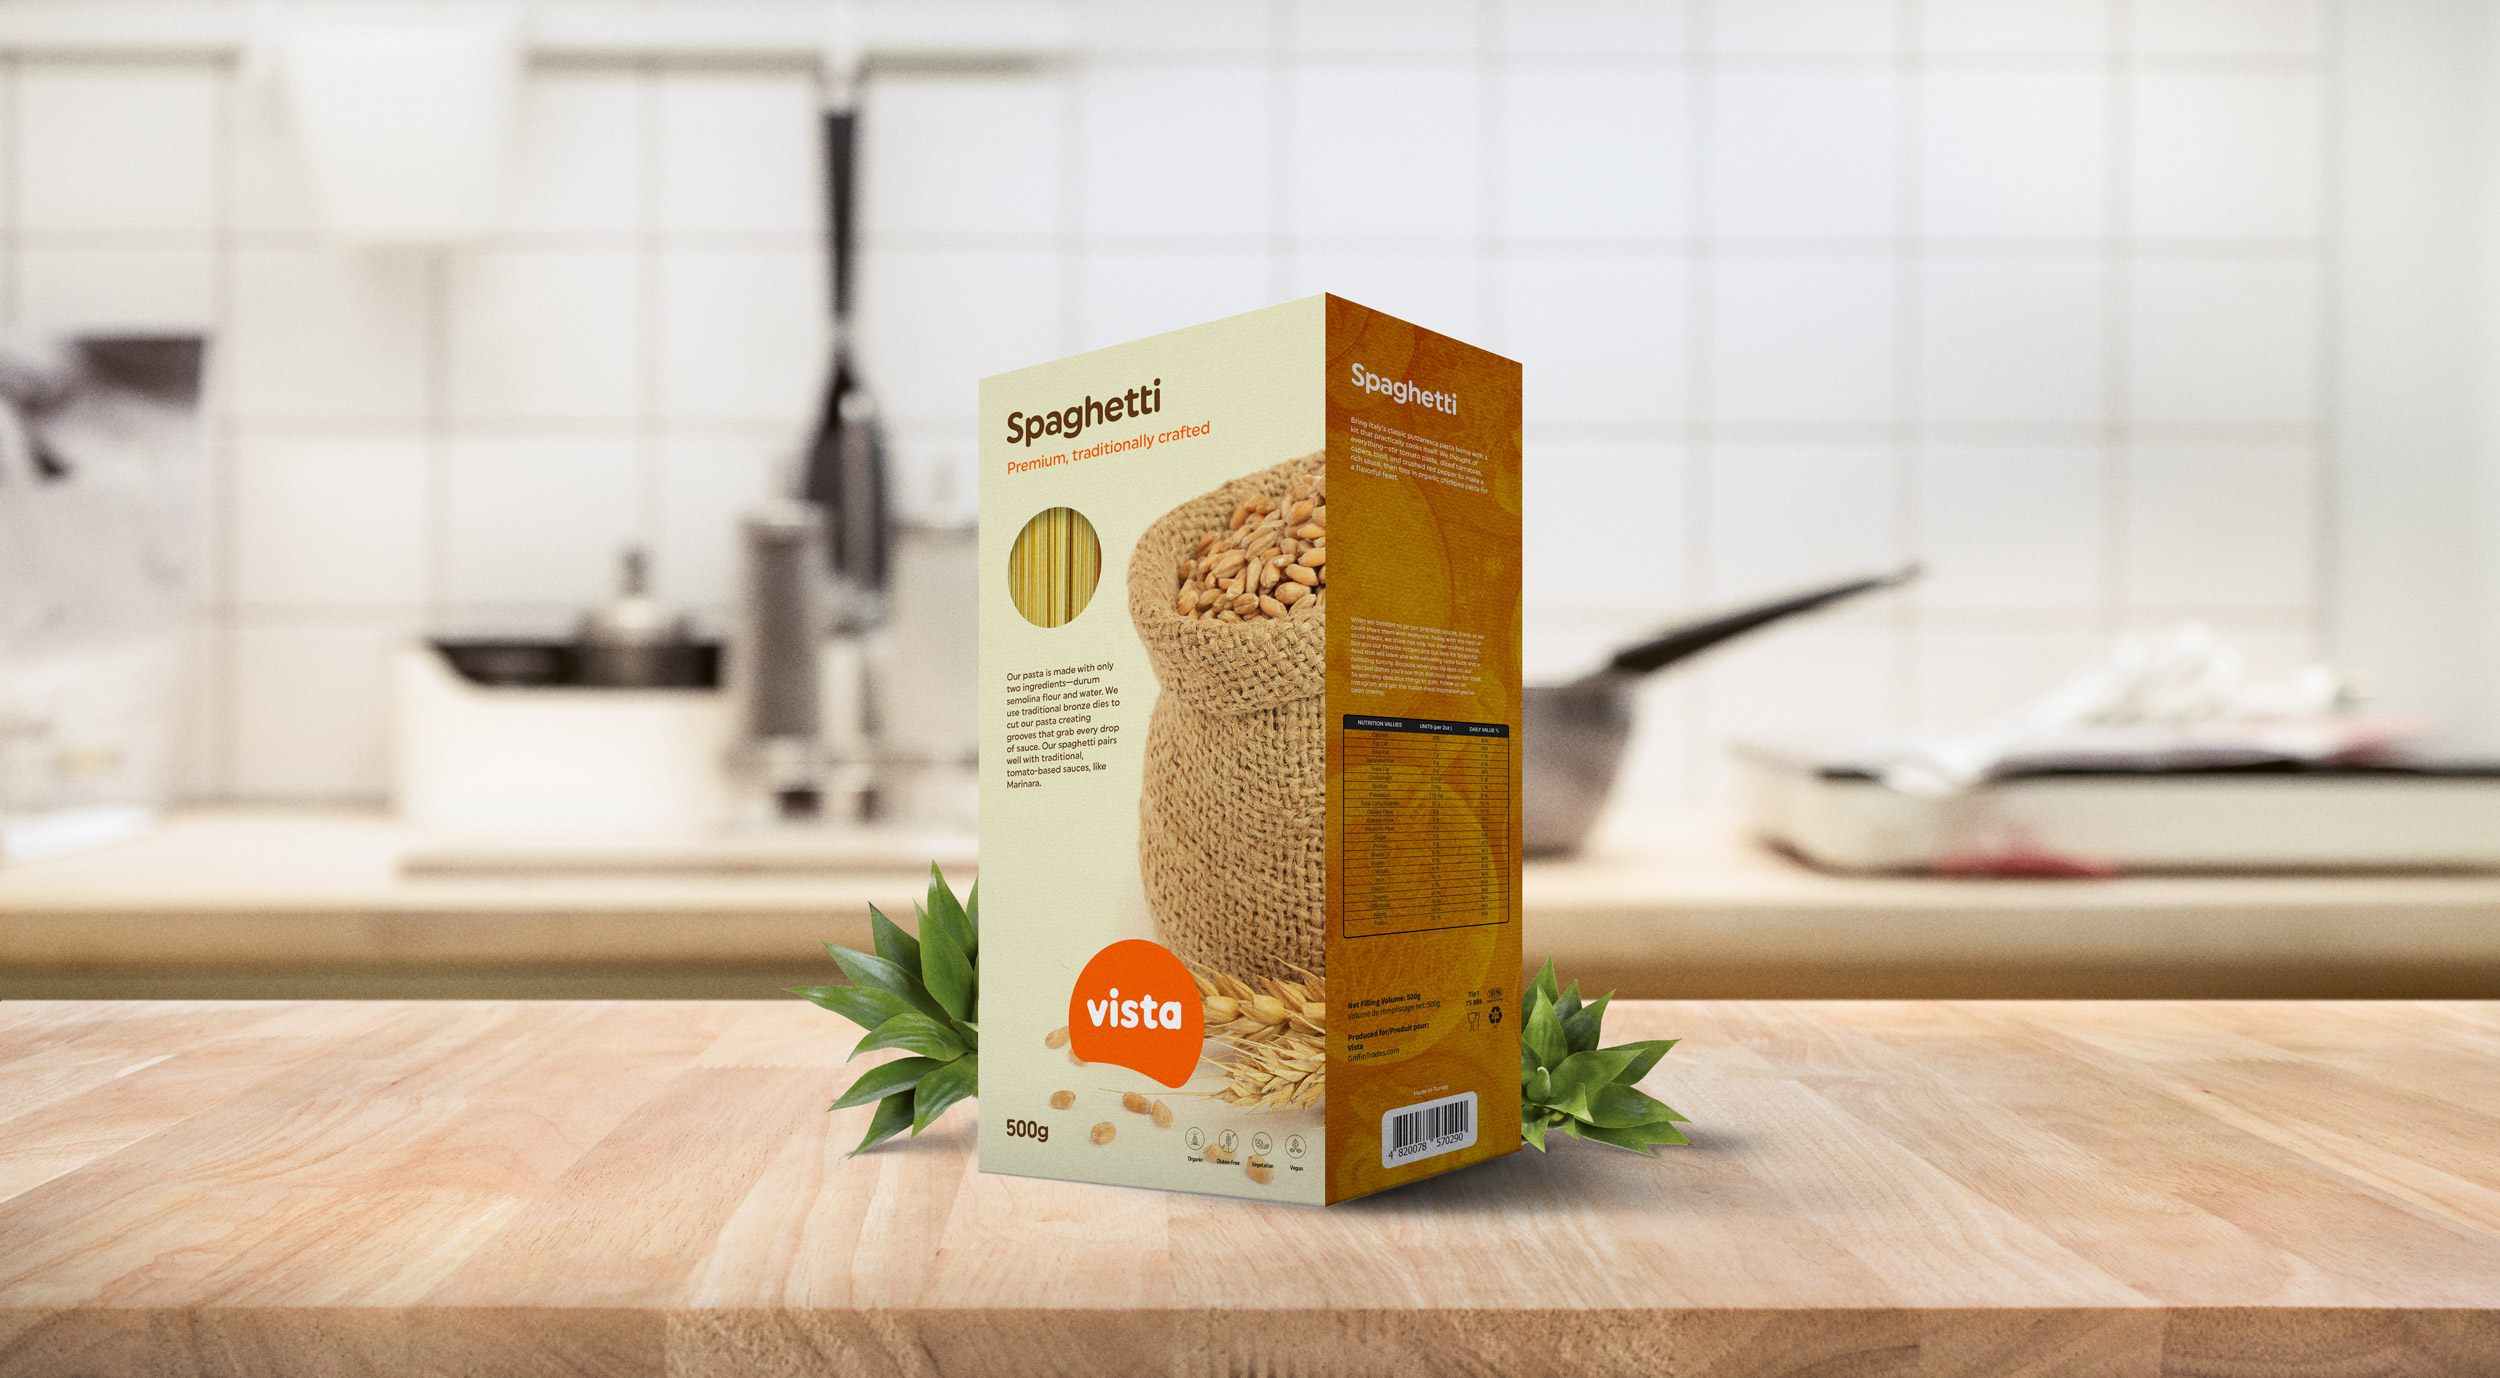 Vista-pasta-package.jpg